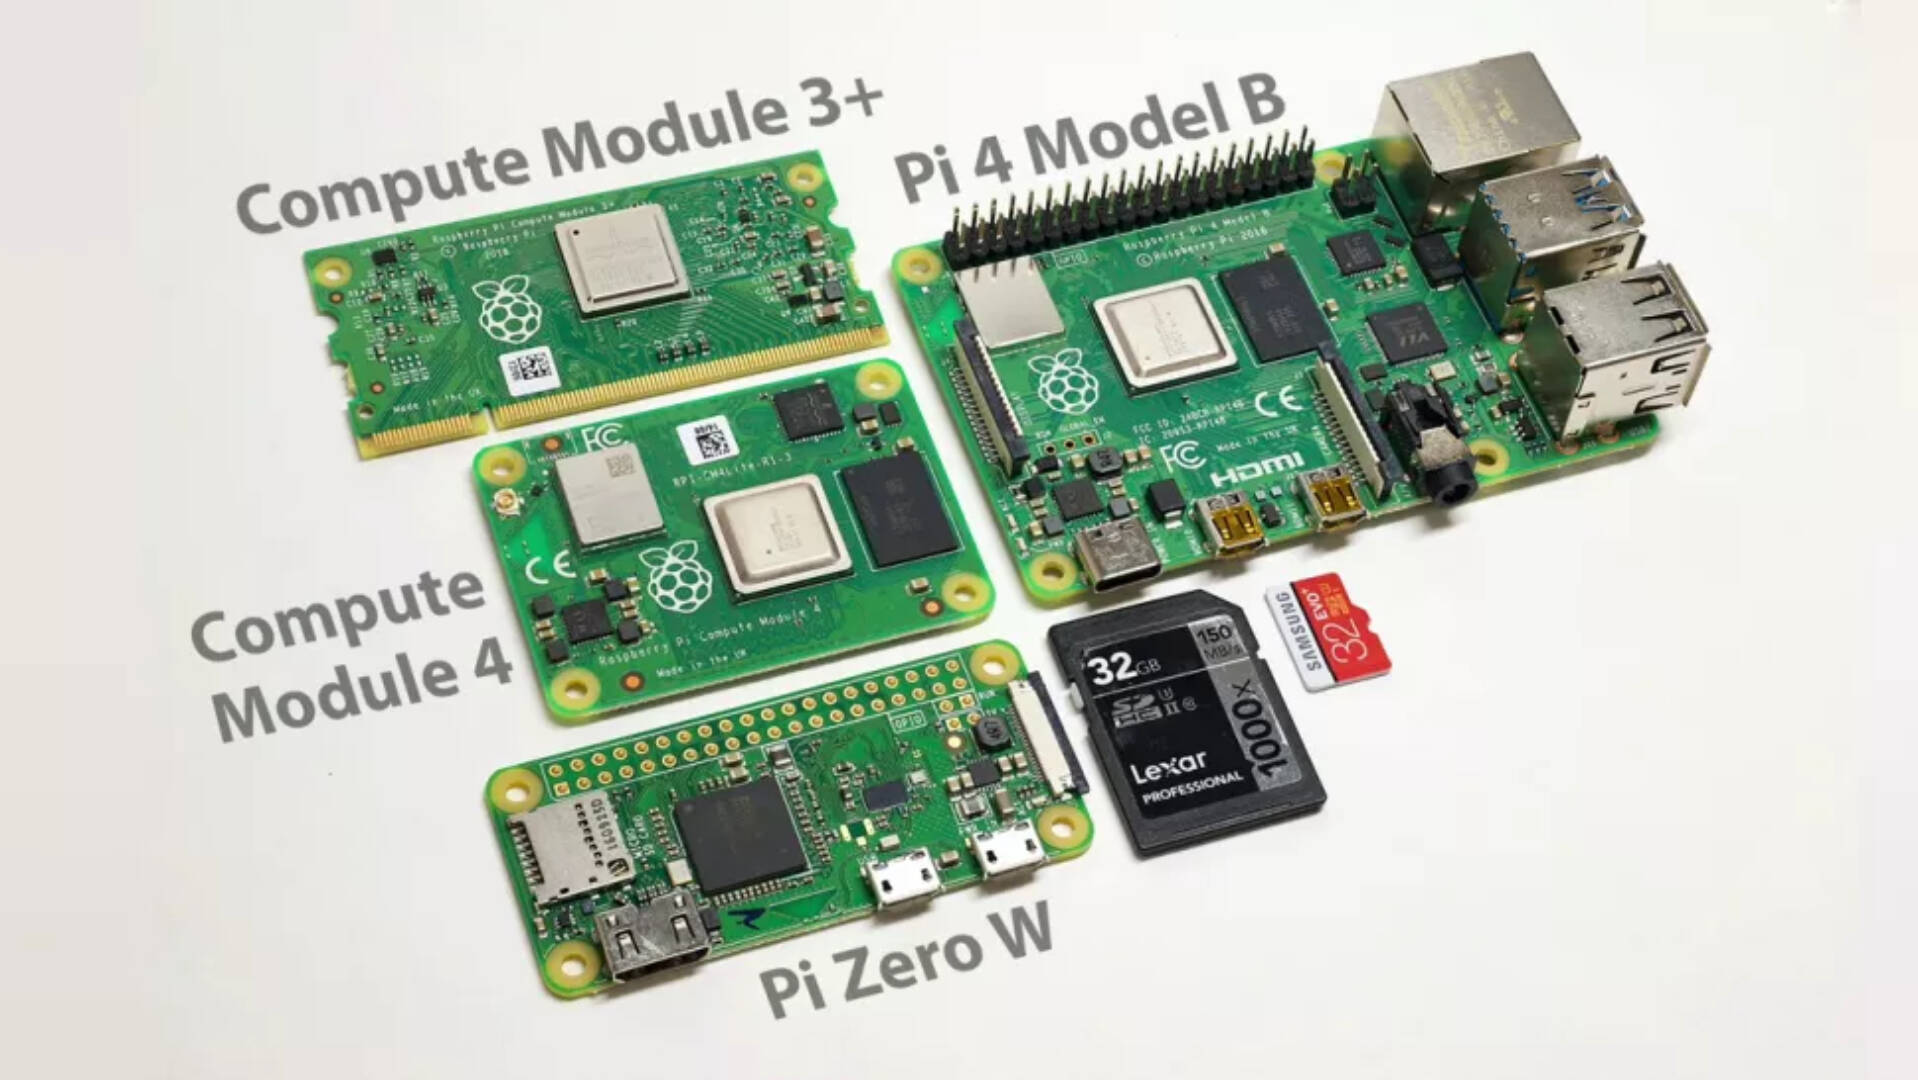 Compute Module 4